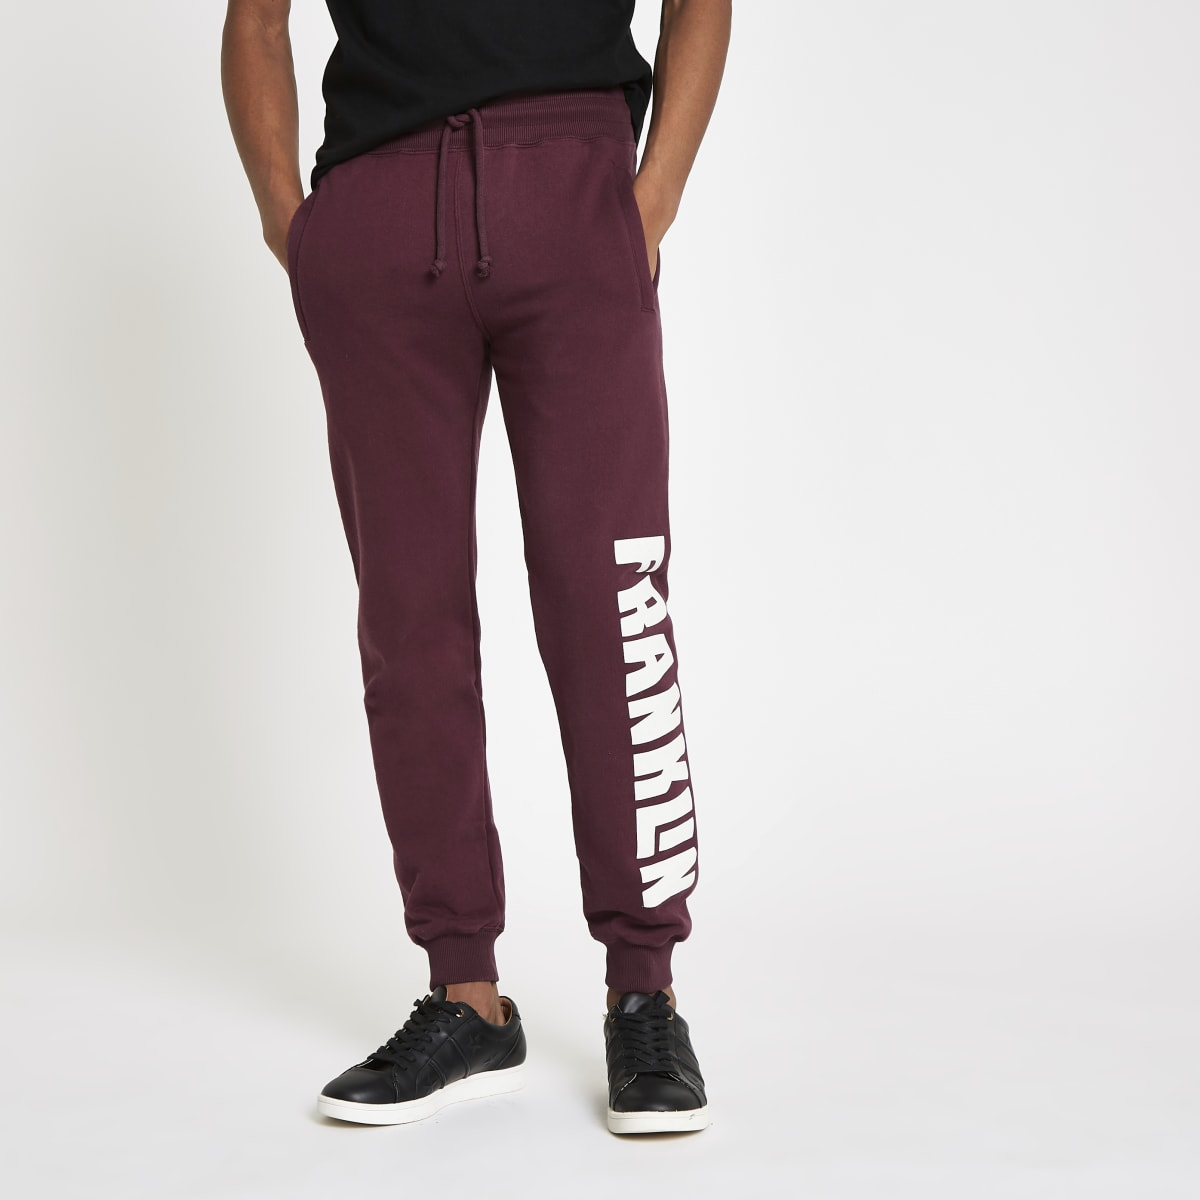 Franklin & Marshall – Pantalon de jogging en molleton bordeaux